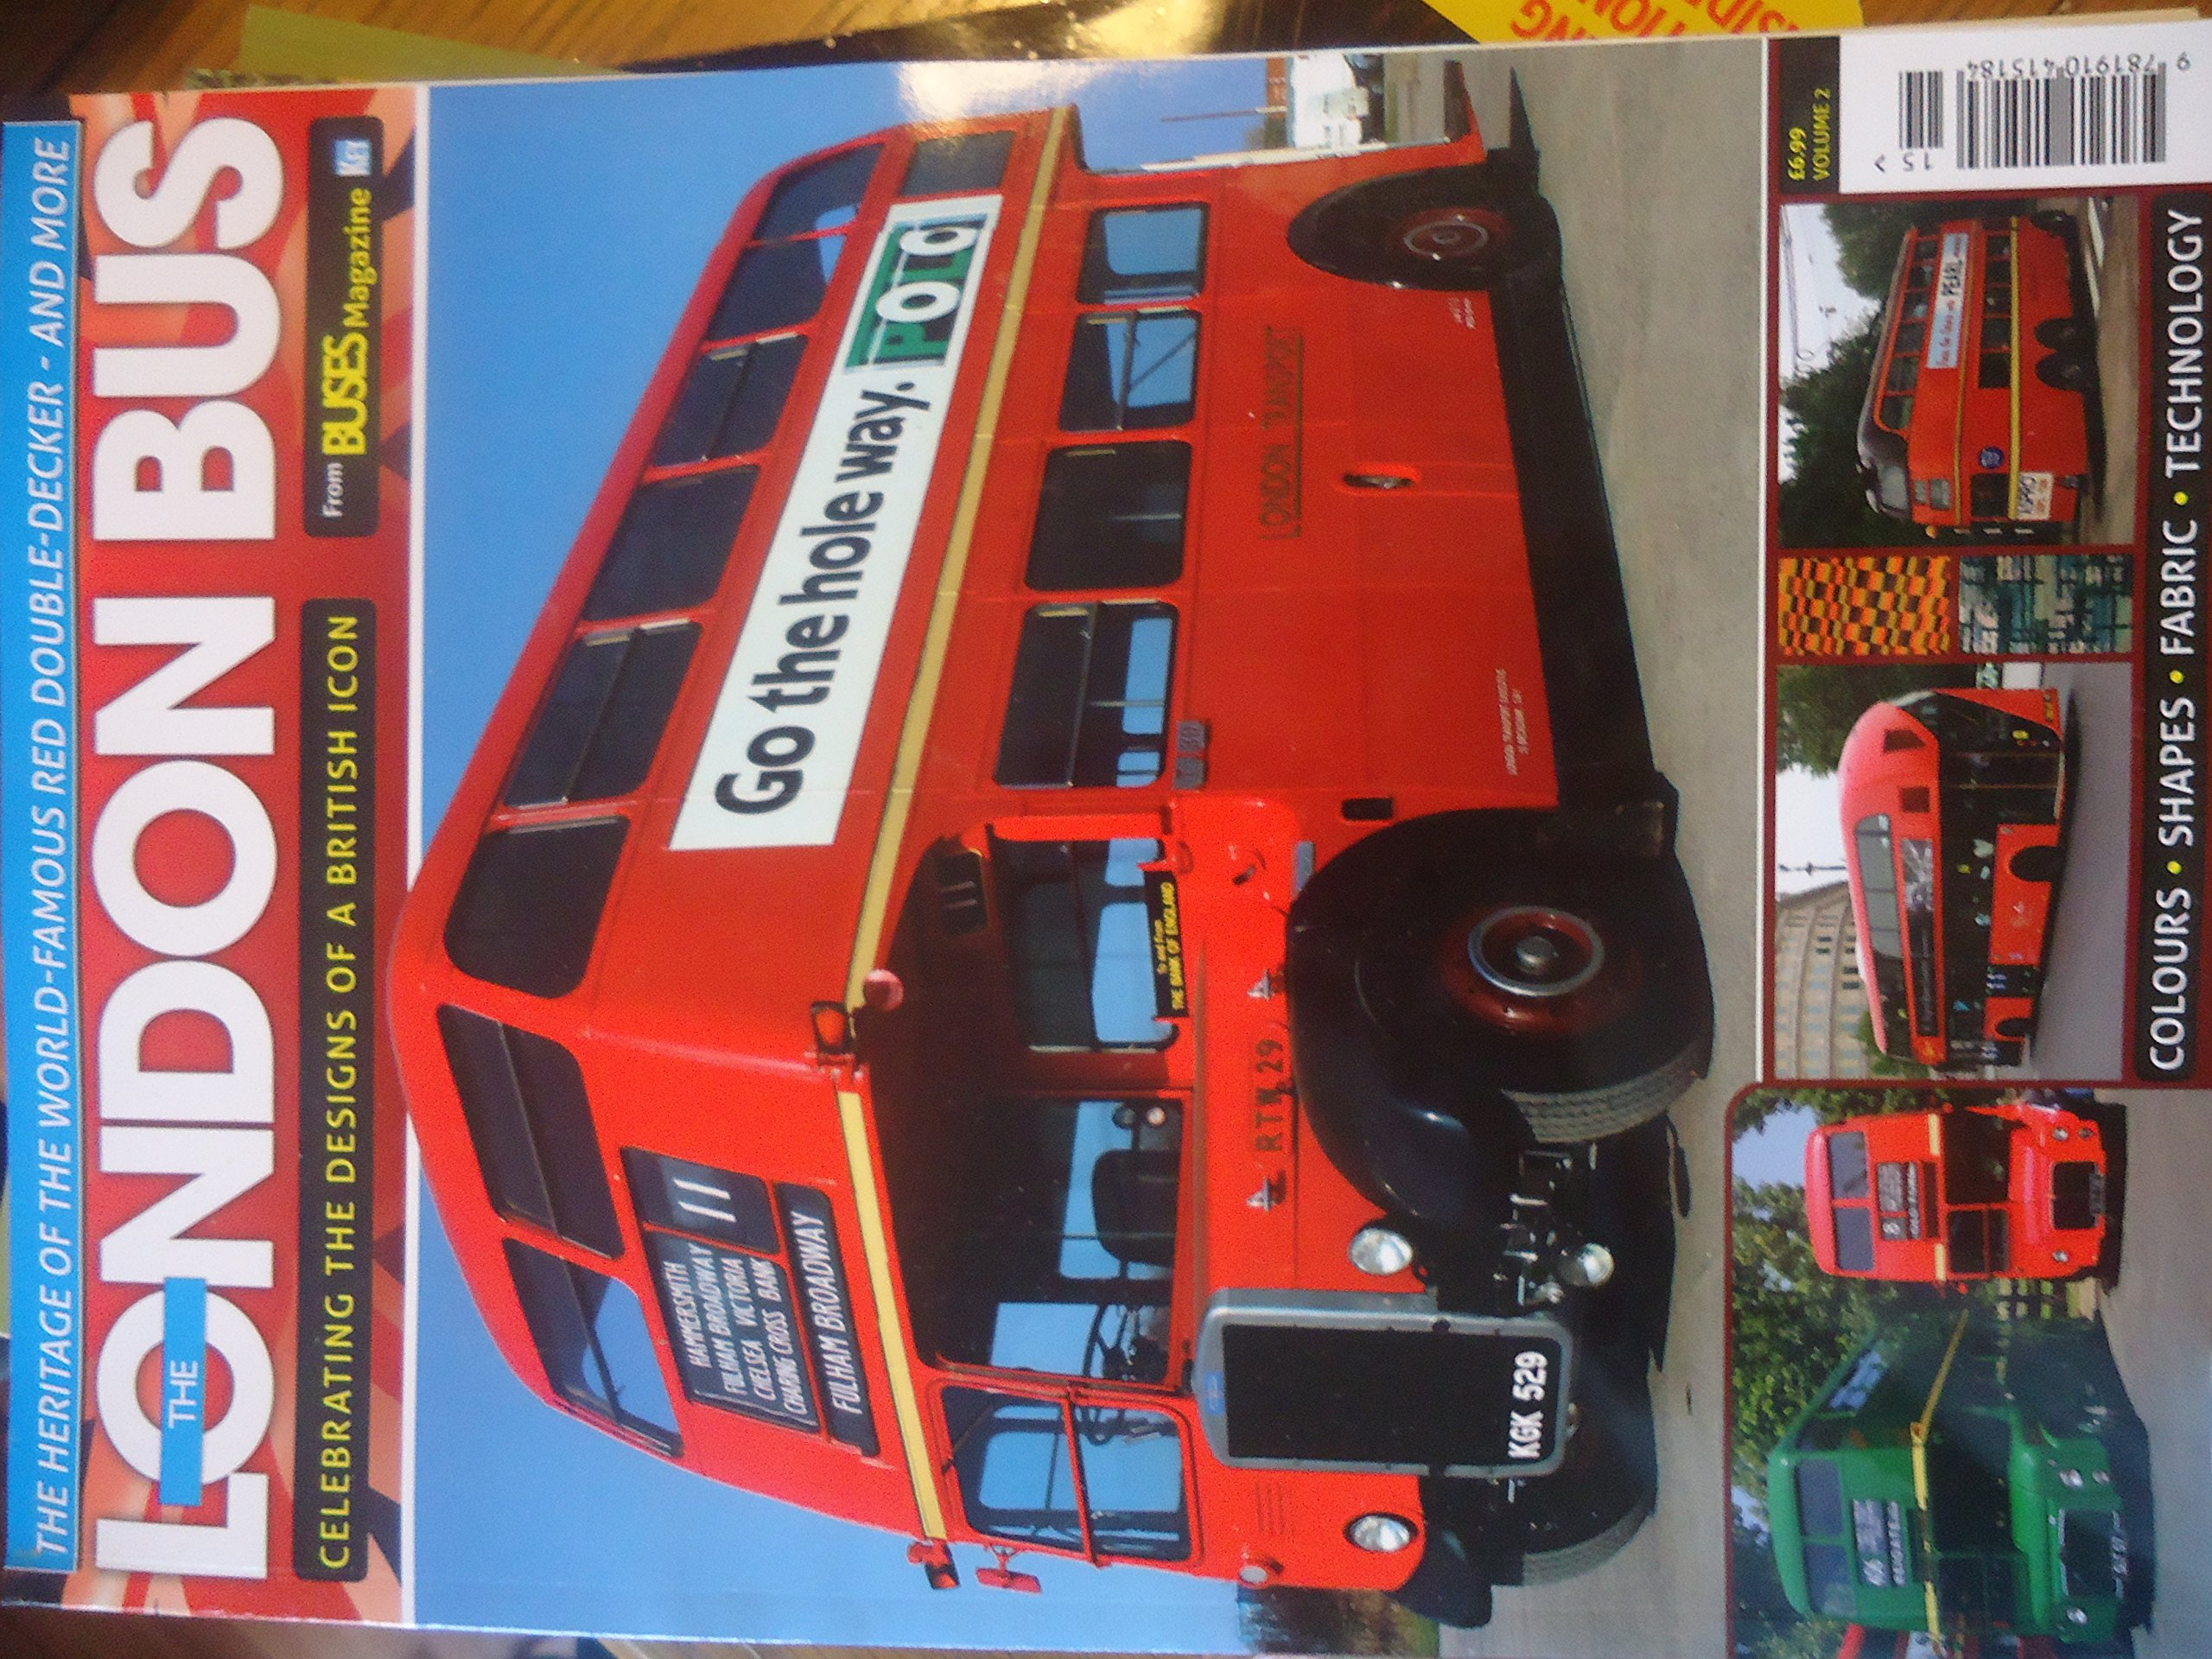 London Bus: Volume 2